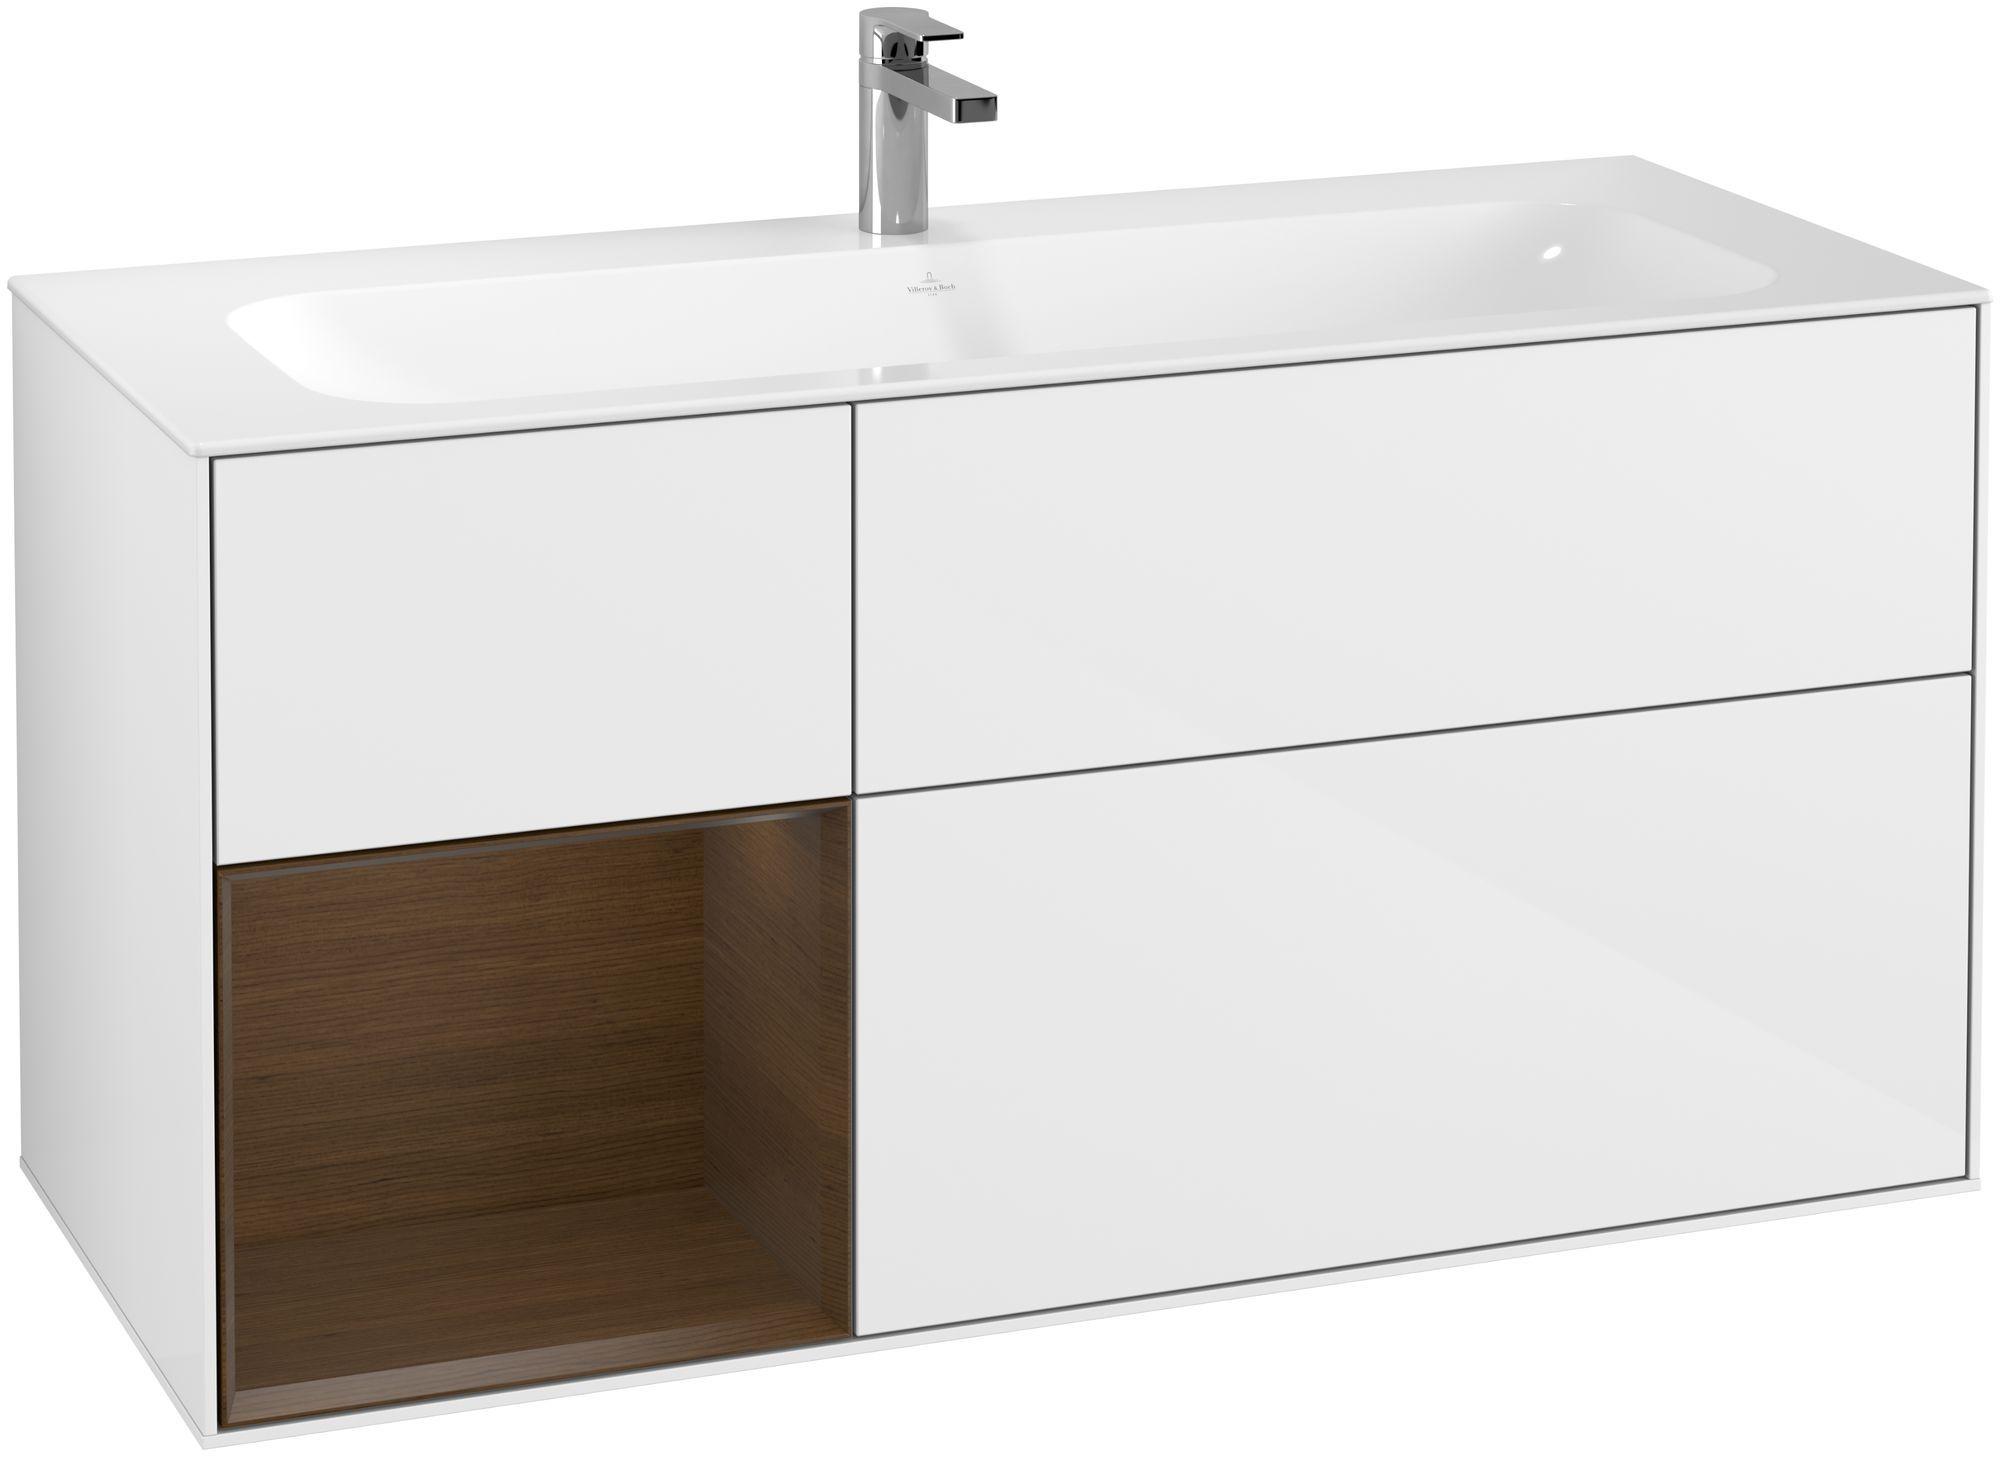 Villeroy & Boch Finion F06 Waschtischunterschrank mit Regalelement 3 Auszüge LED-Beleuchtung B:119,6xH:59,1xT:49,8cm Front, Korpus: Glossy White Lack, Regal: Walnut Veneer F060GNGF